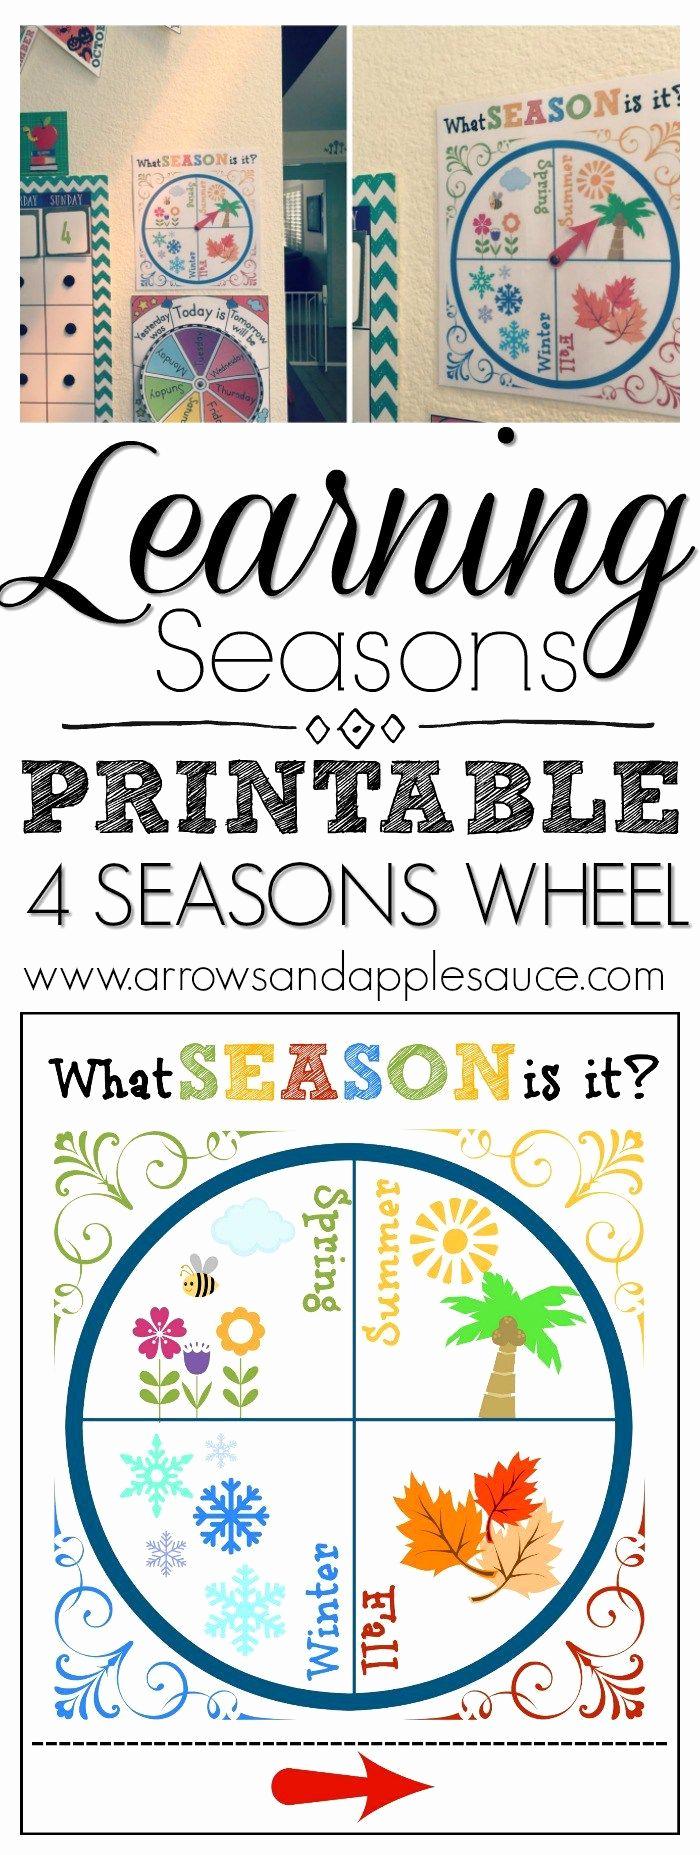 Seasons Worksheets for Preschoolers Unique Our Calendar Wall the Seasons